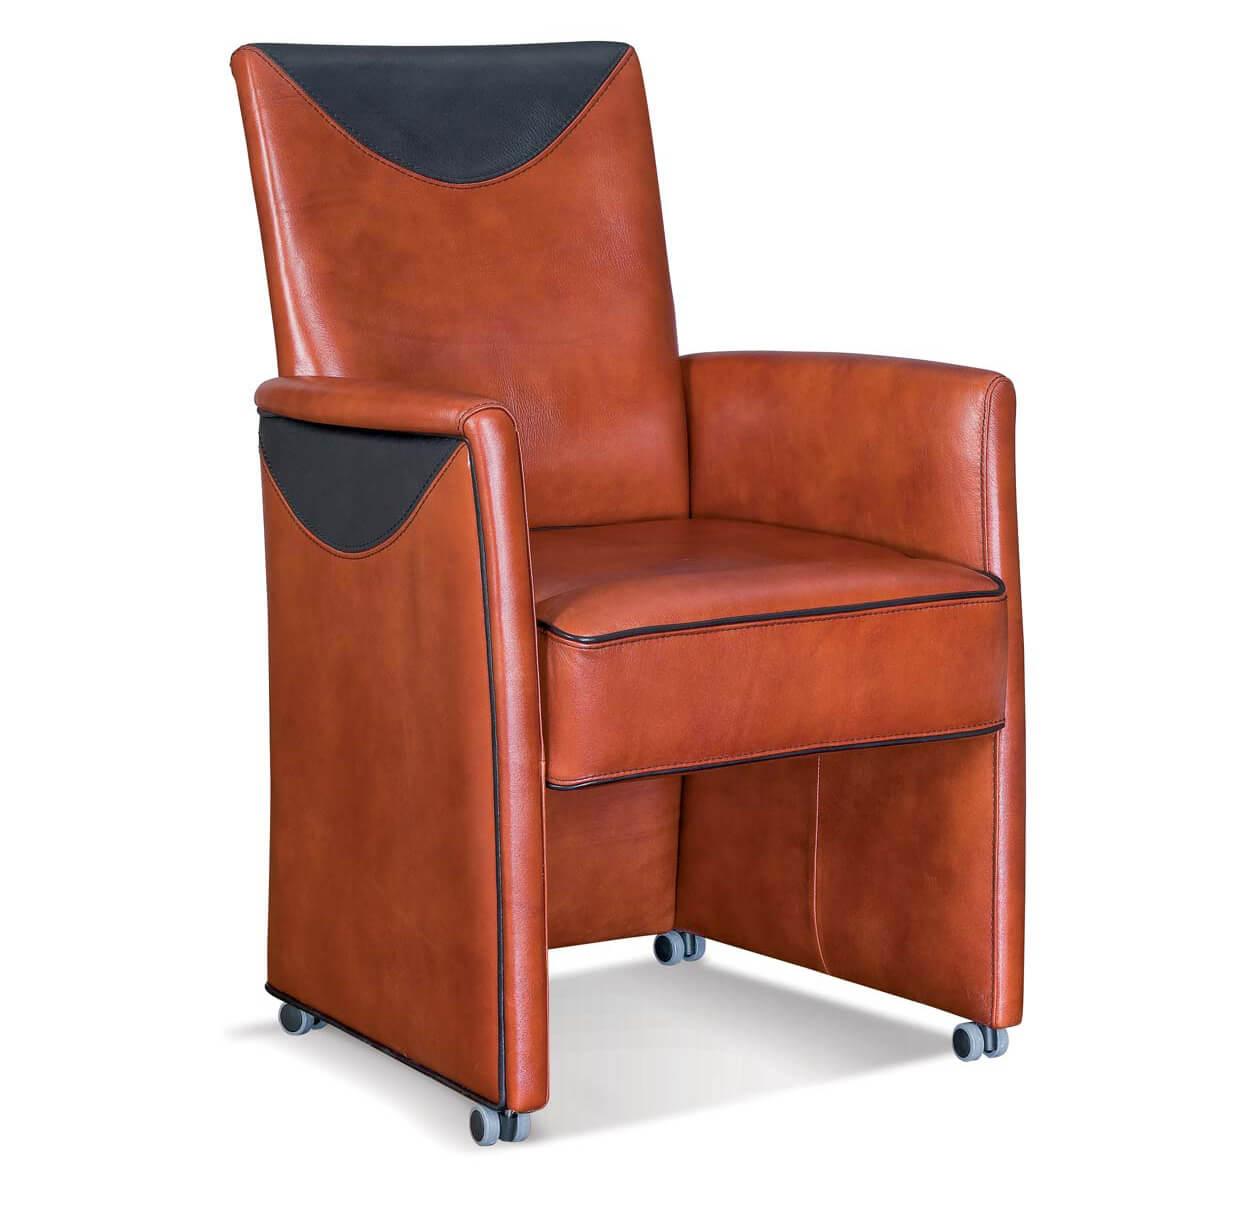 Mare eetkamer fauteuil - Mulleman Meubelen